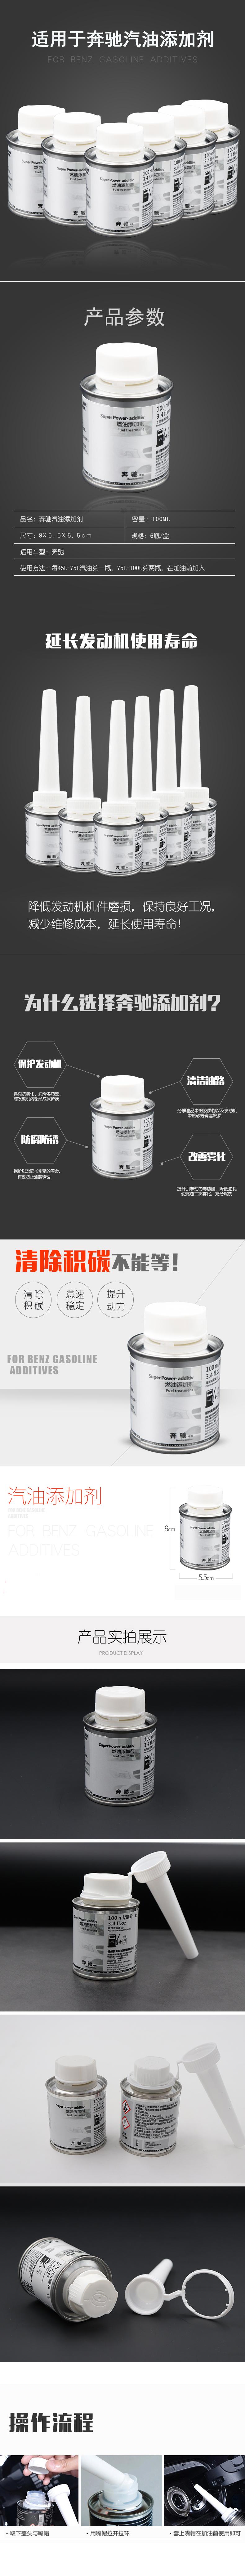 Applicable To Mercedes Benz Original Gasoline Additive Fuel Additives Description Feedback